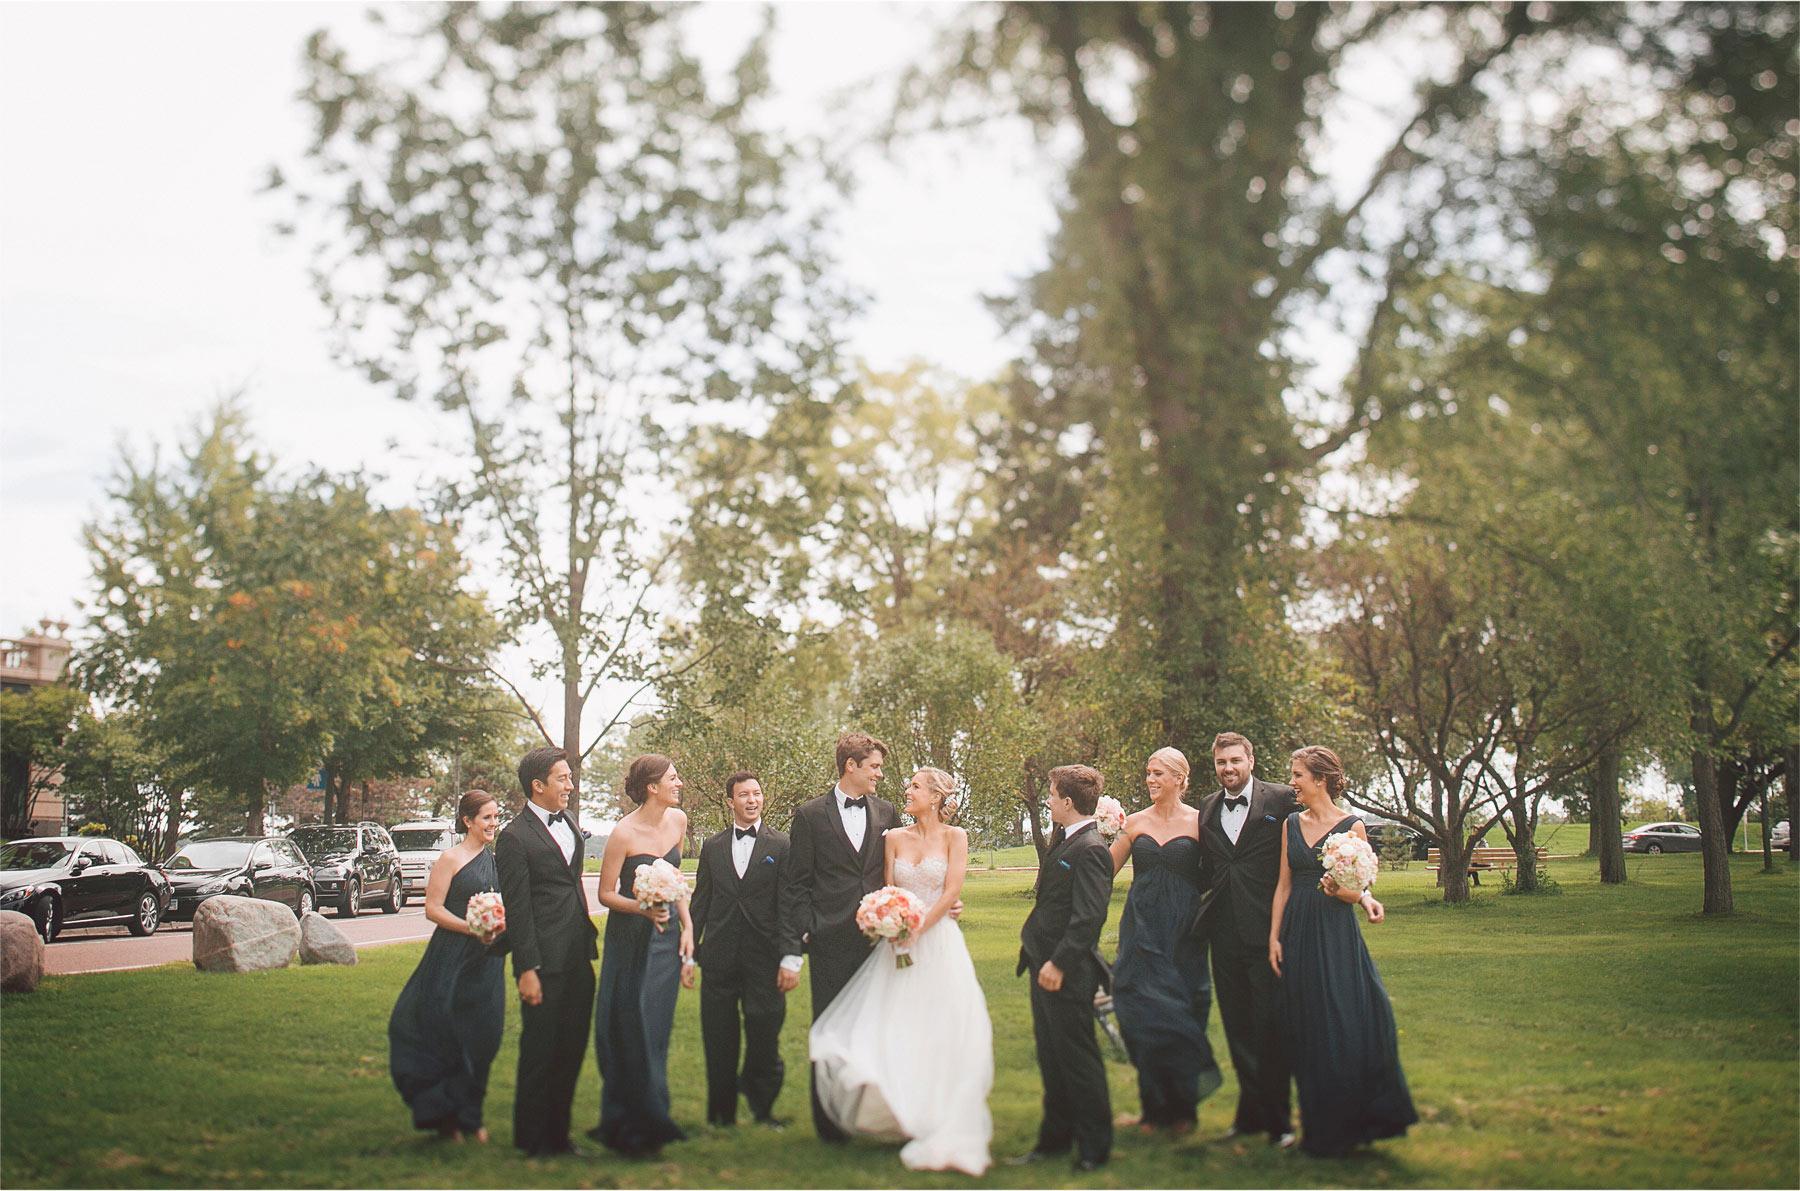 10-Minneapolis-Minnesota-Wedding-Photographer-by-Andrew-Vick-Photography-Summer-Calhoun-Beach-Club-Bride-Groom-Bridal-Party-Bridesmaids-Flowers-Groomsmen-Vintage-Michelle-and-Kevin.jpg